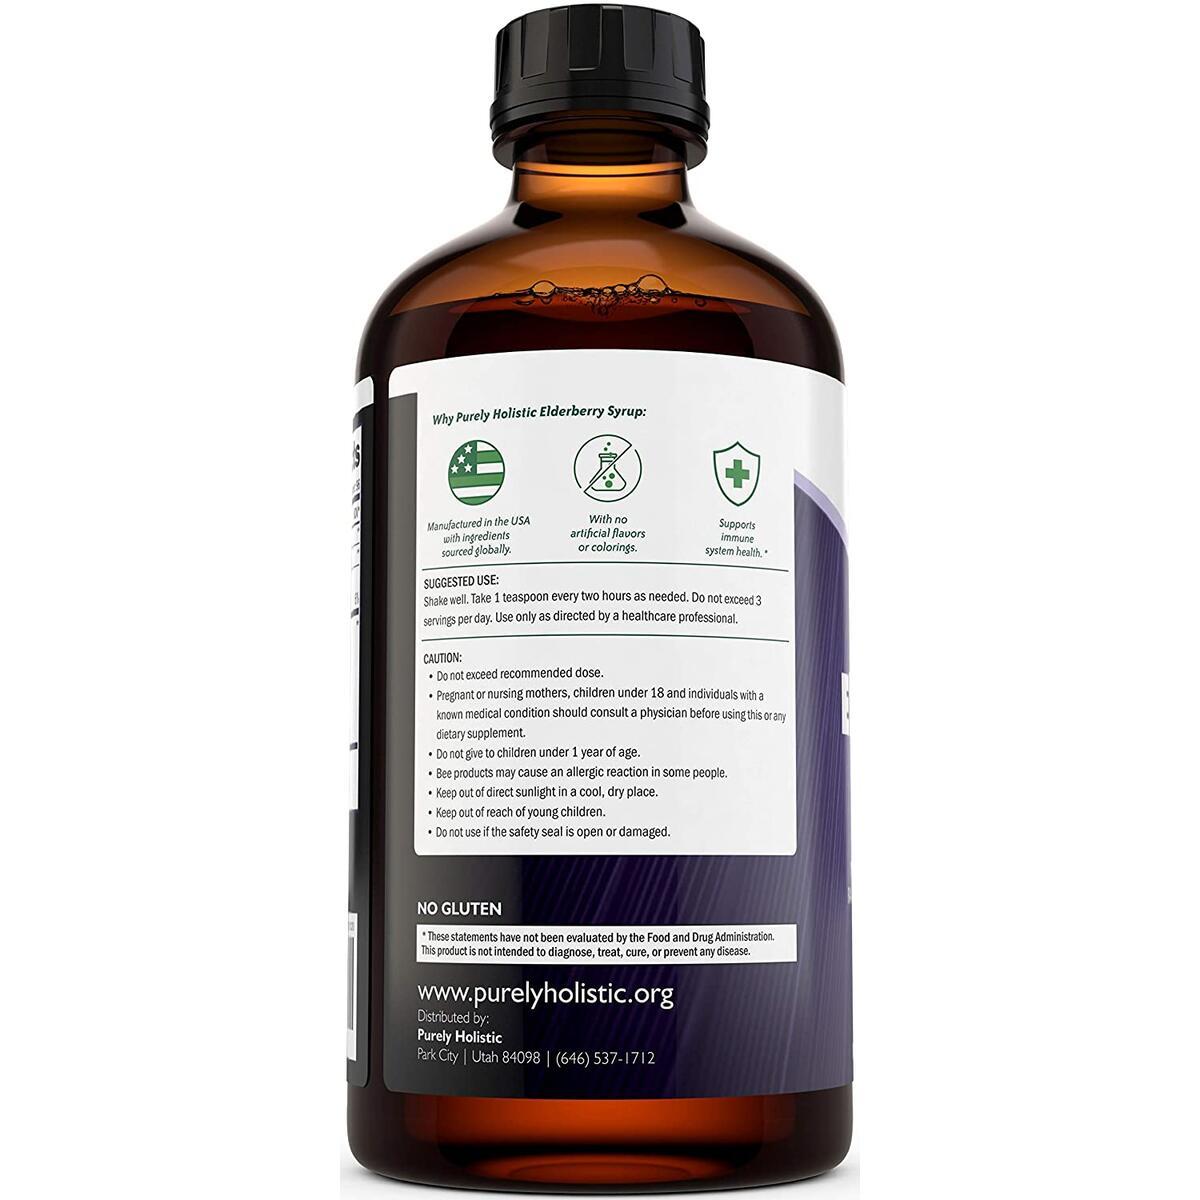 Elderberry Syrup - 50% MORE 16 fl oz - With Organic Black Sambucus Elderberry, Apple Cider Vinegar, Raw Honey, Propolis & Echinacea - Immune Support and Immune Booster for Adults & Kids